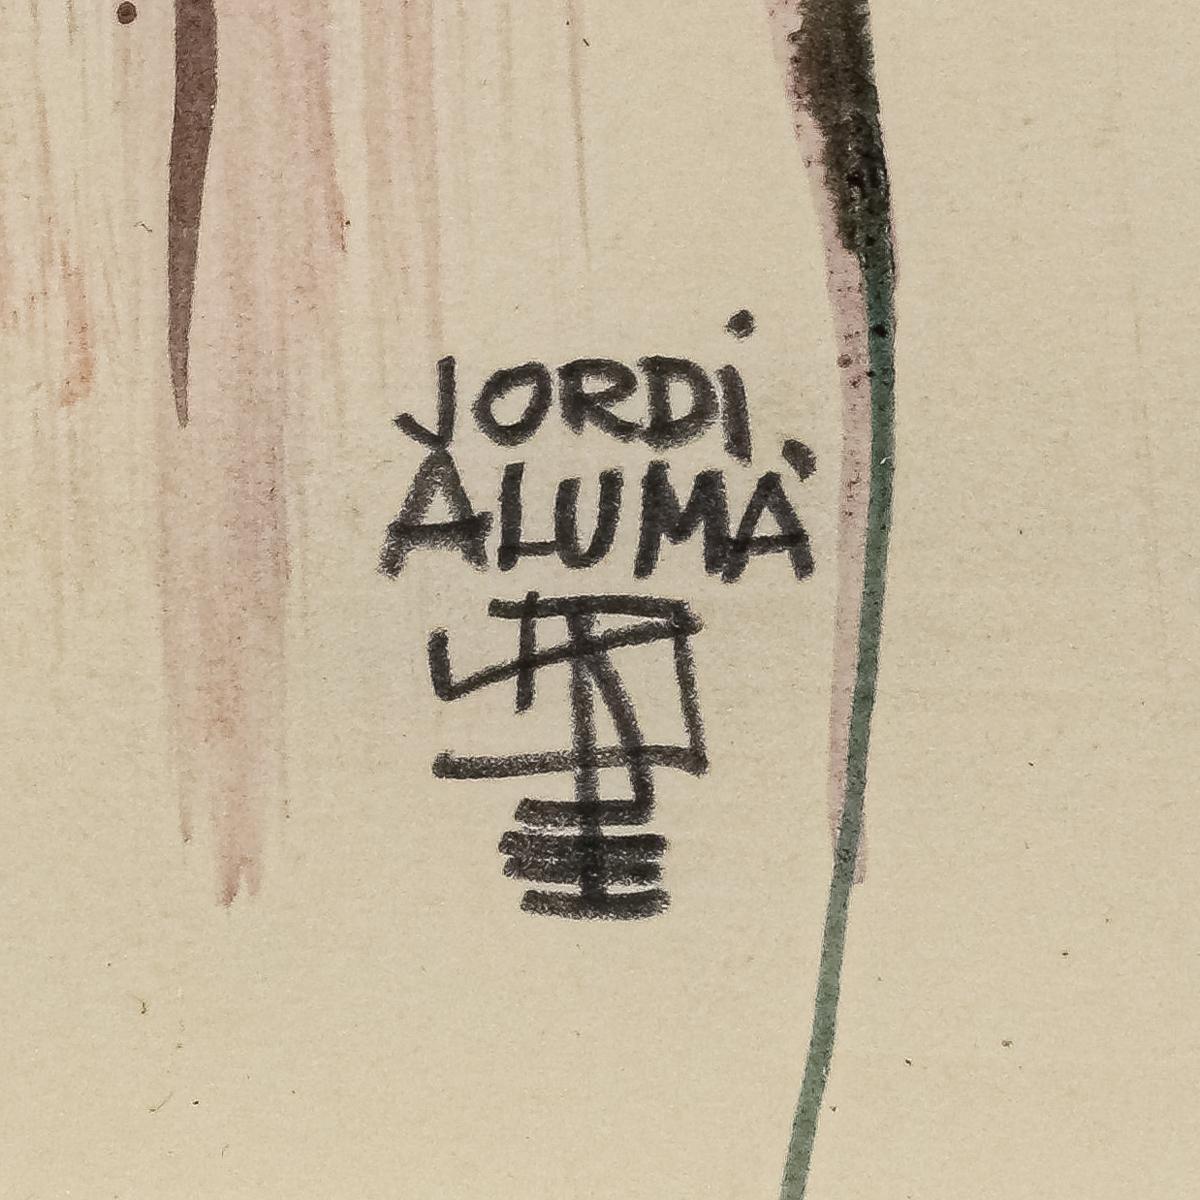 ALUMÀ MASVIDAL, JORDI